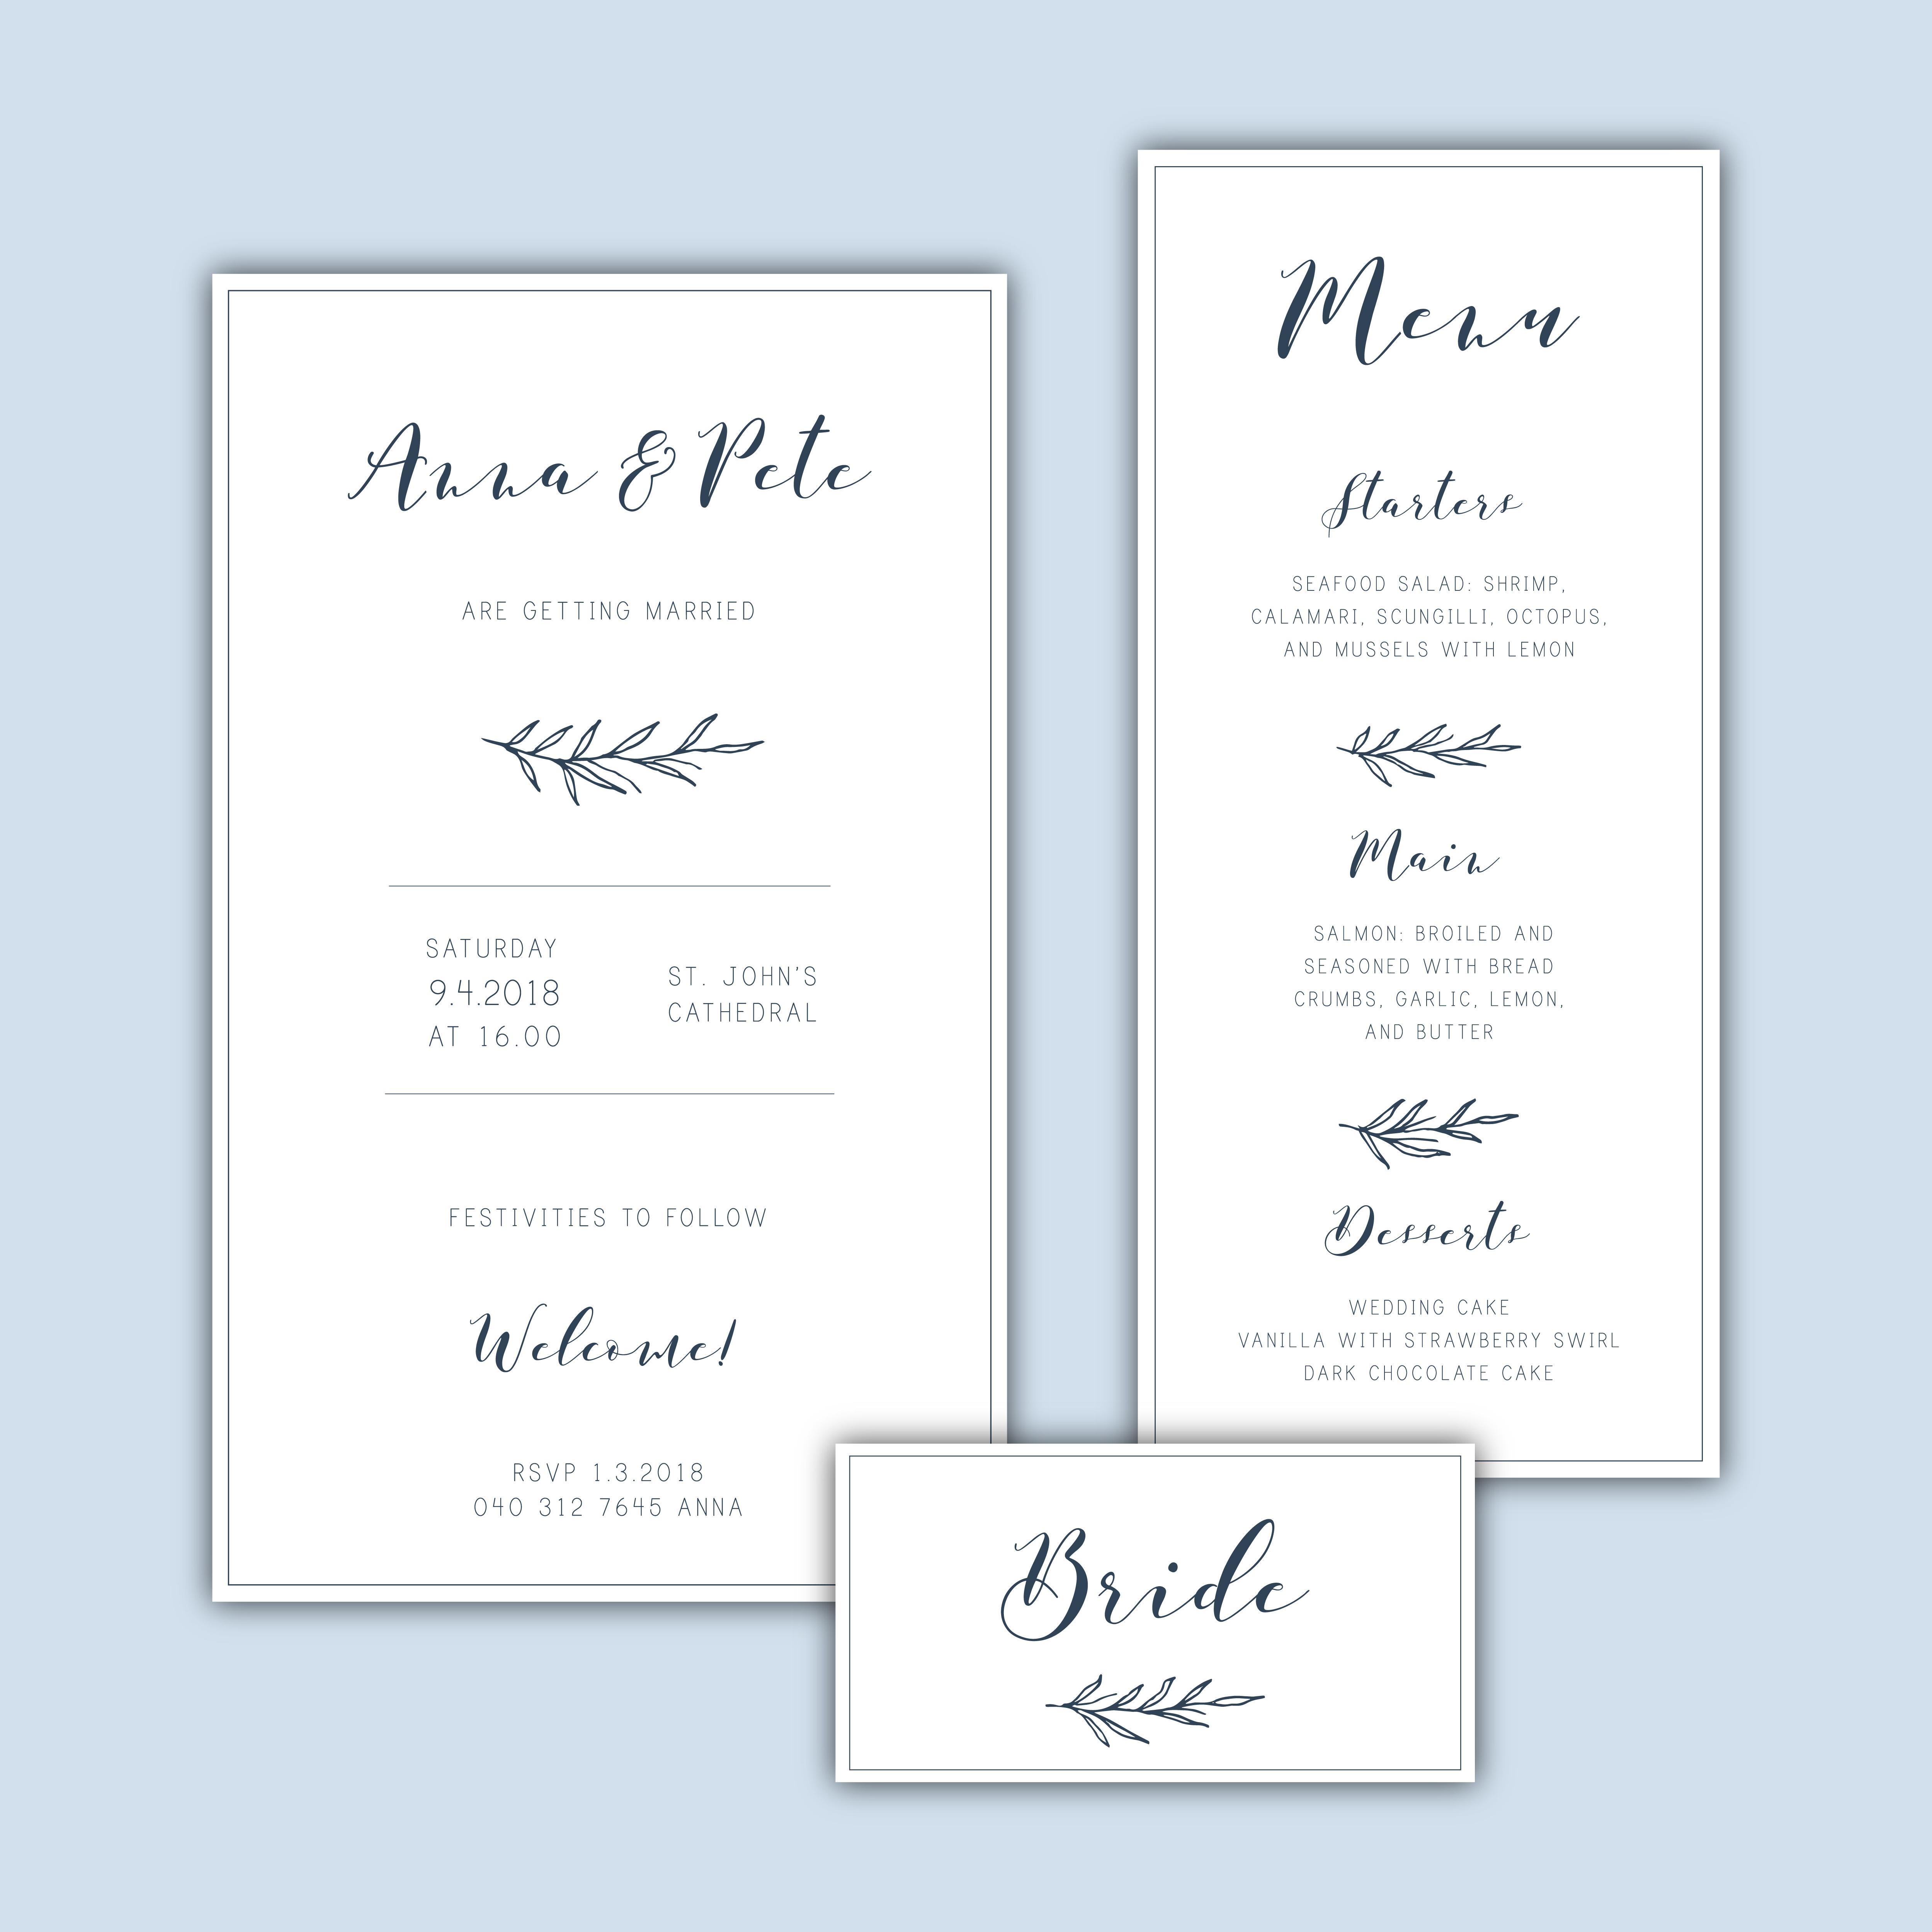 classic minimalist wedding invitation